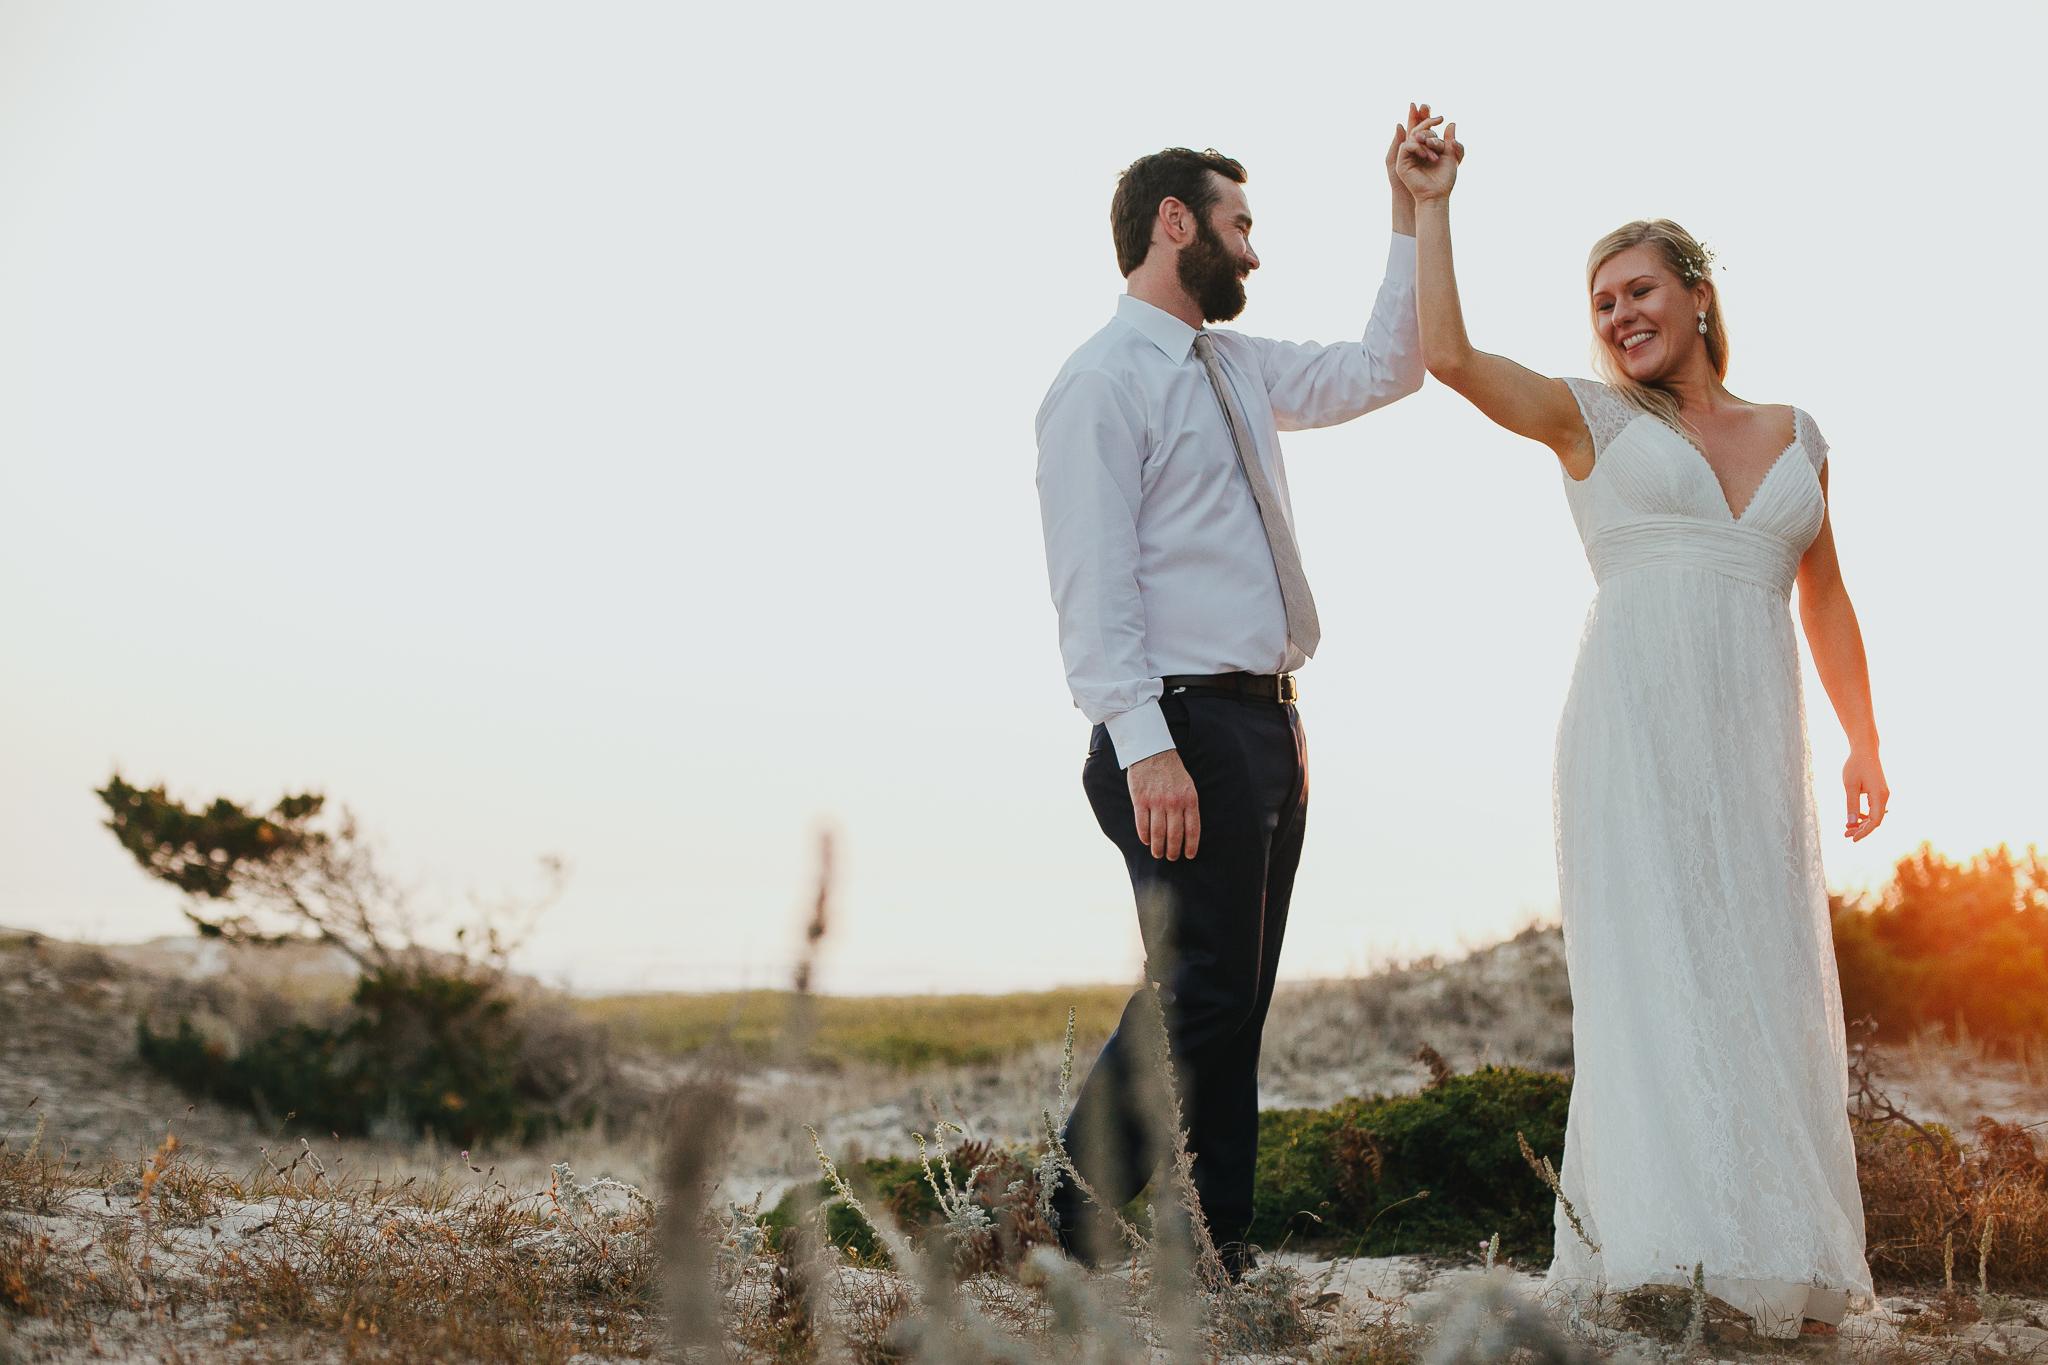 Archer_Inspired_Photography_Pacific_Grove_Ansilomar_Beach_Carmel_Valley_Wedding-196.jpg